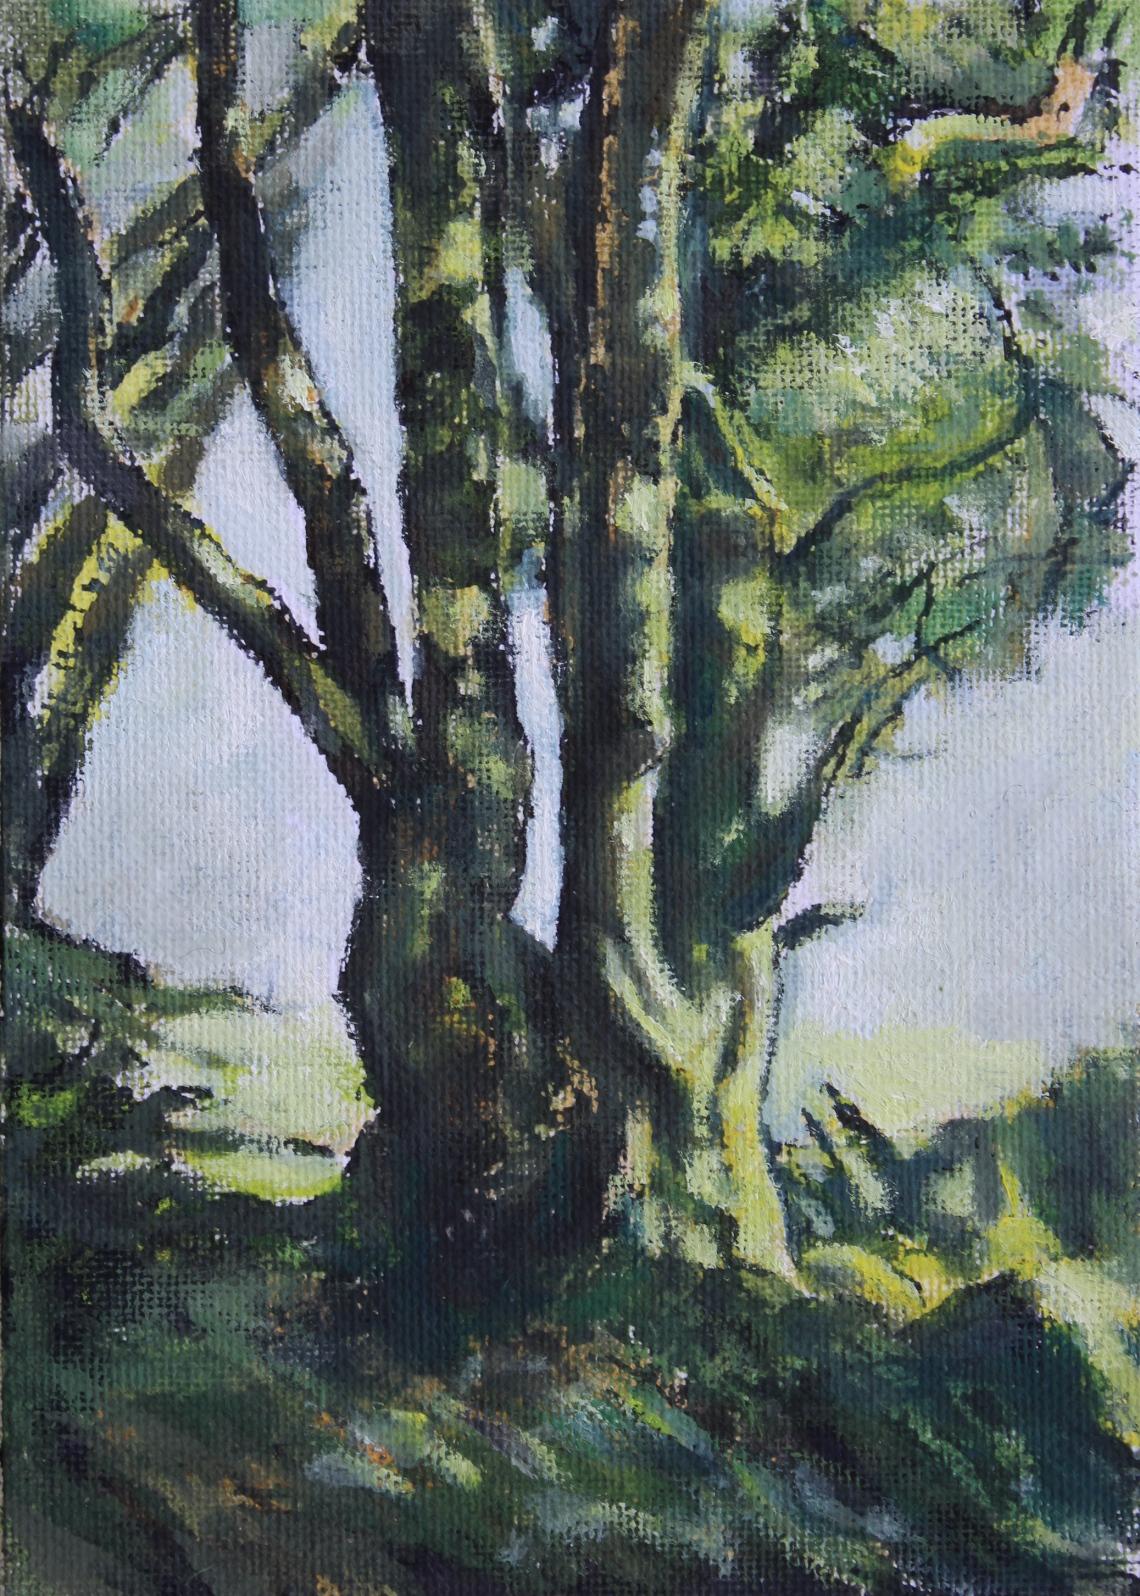 irish ash and ivy in winter 2